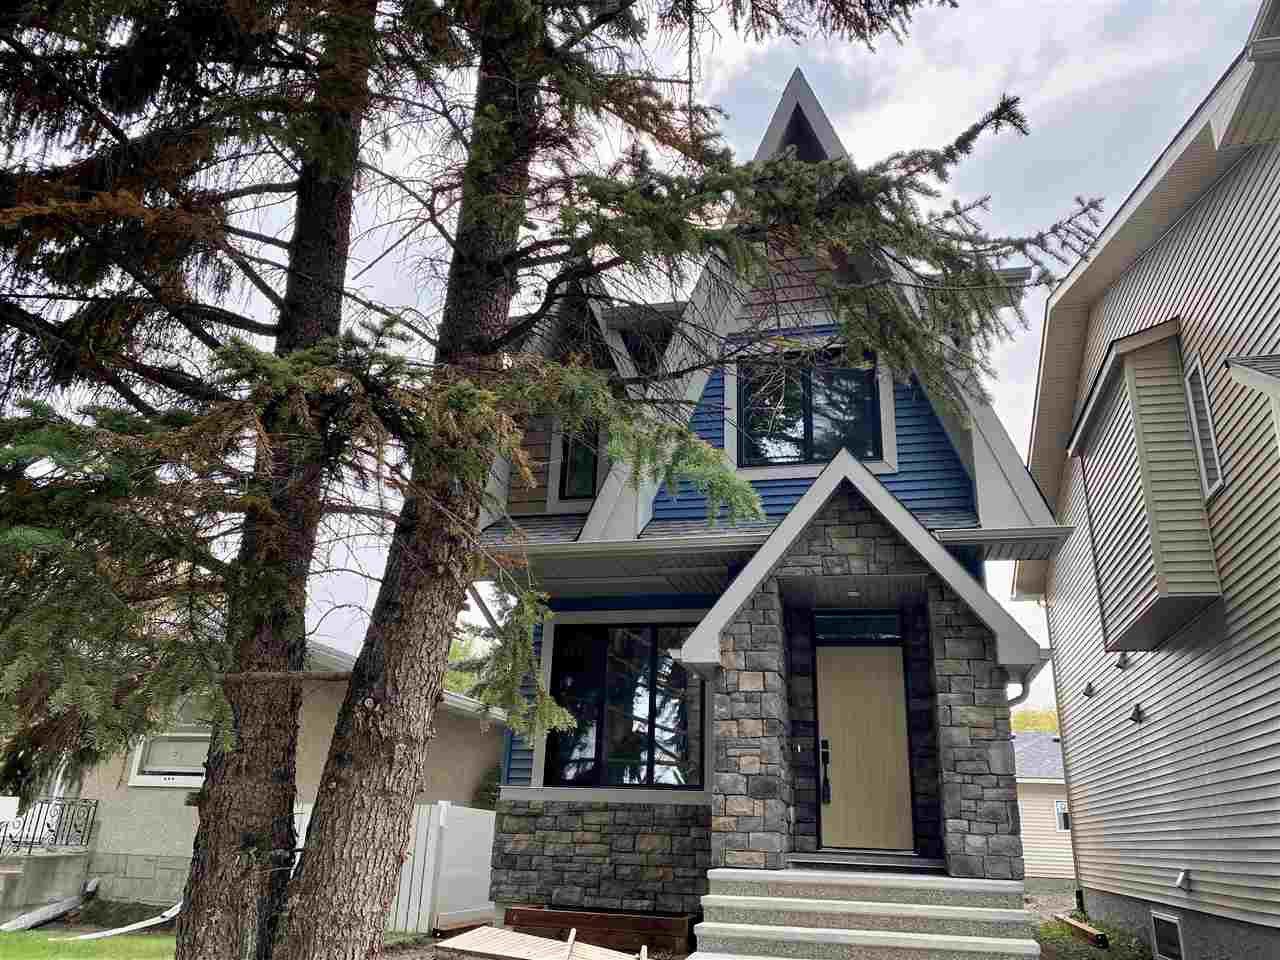 Main Photo: 9111 65 Avenue in Edmonton: Zone 17 House for sale : MLS®# E4221417